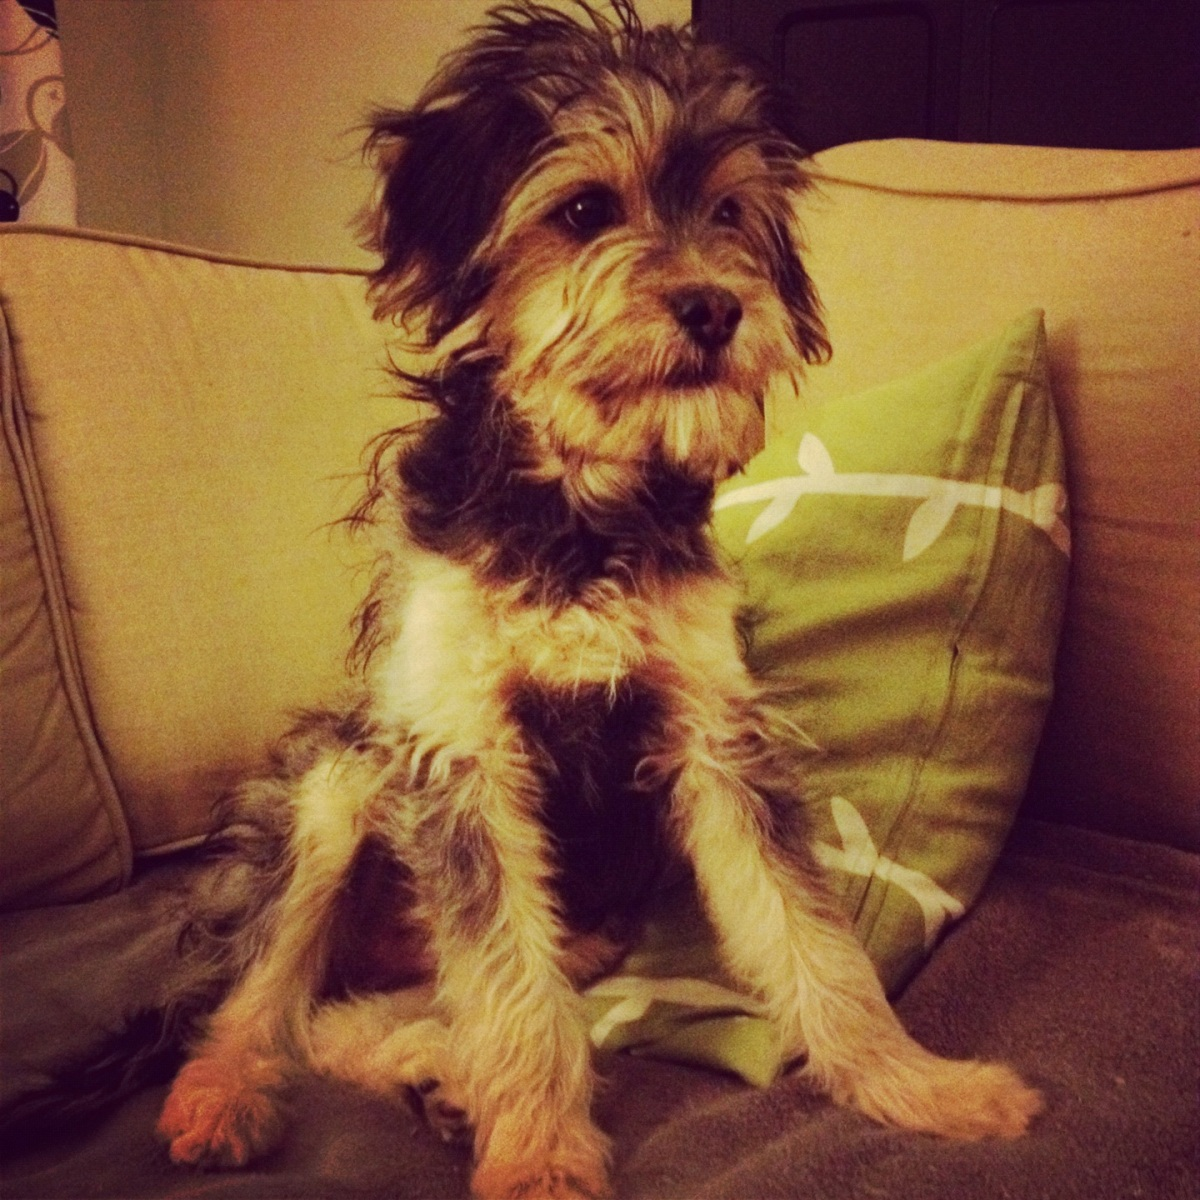 arlo the puppy